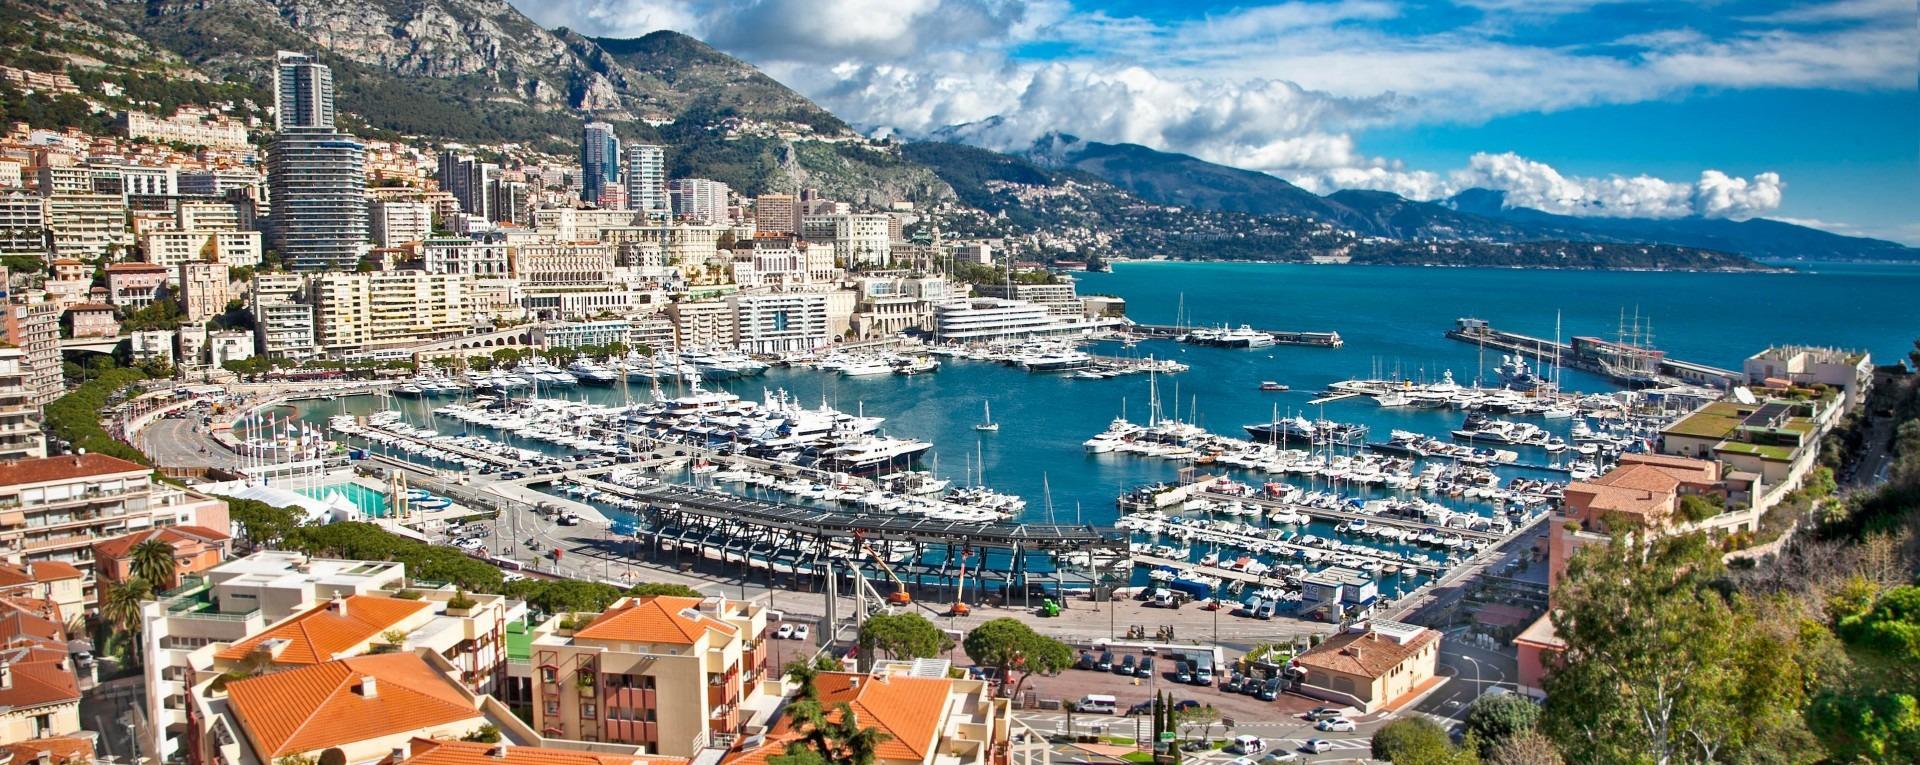 Sonbaharda Fransız Rivierası Cote D'azur